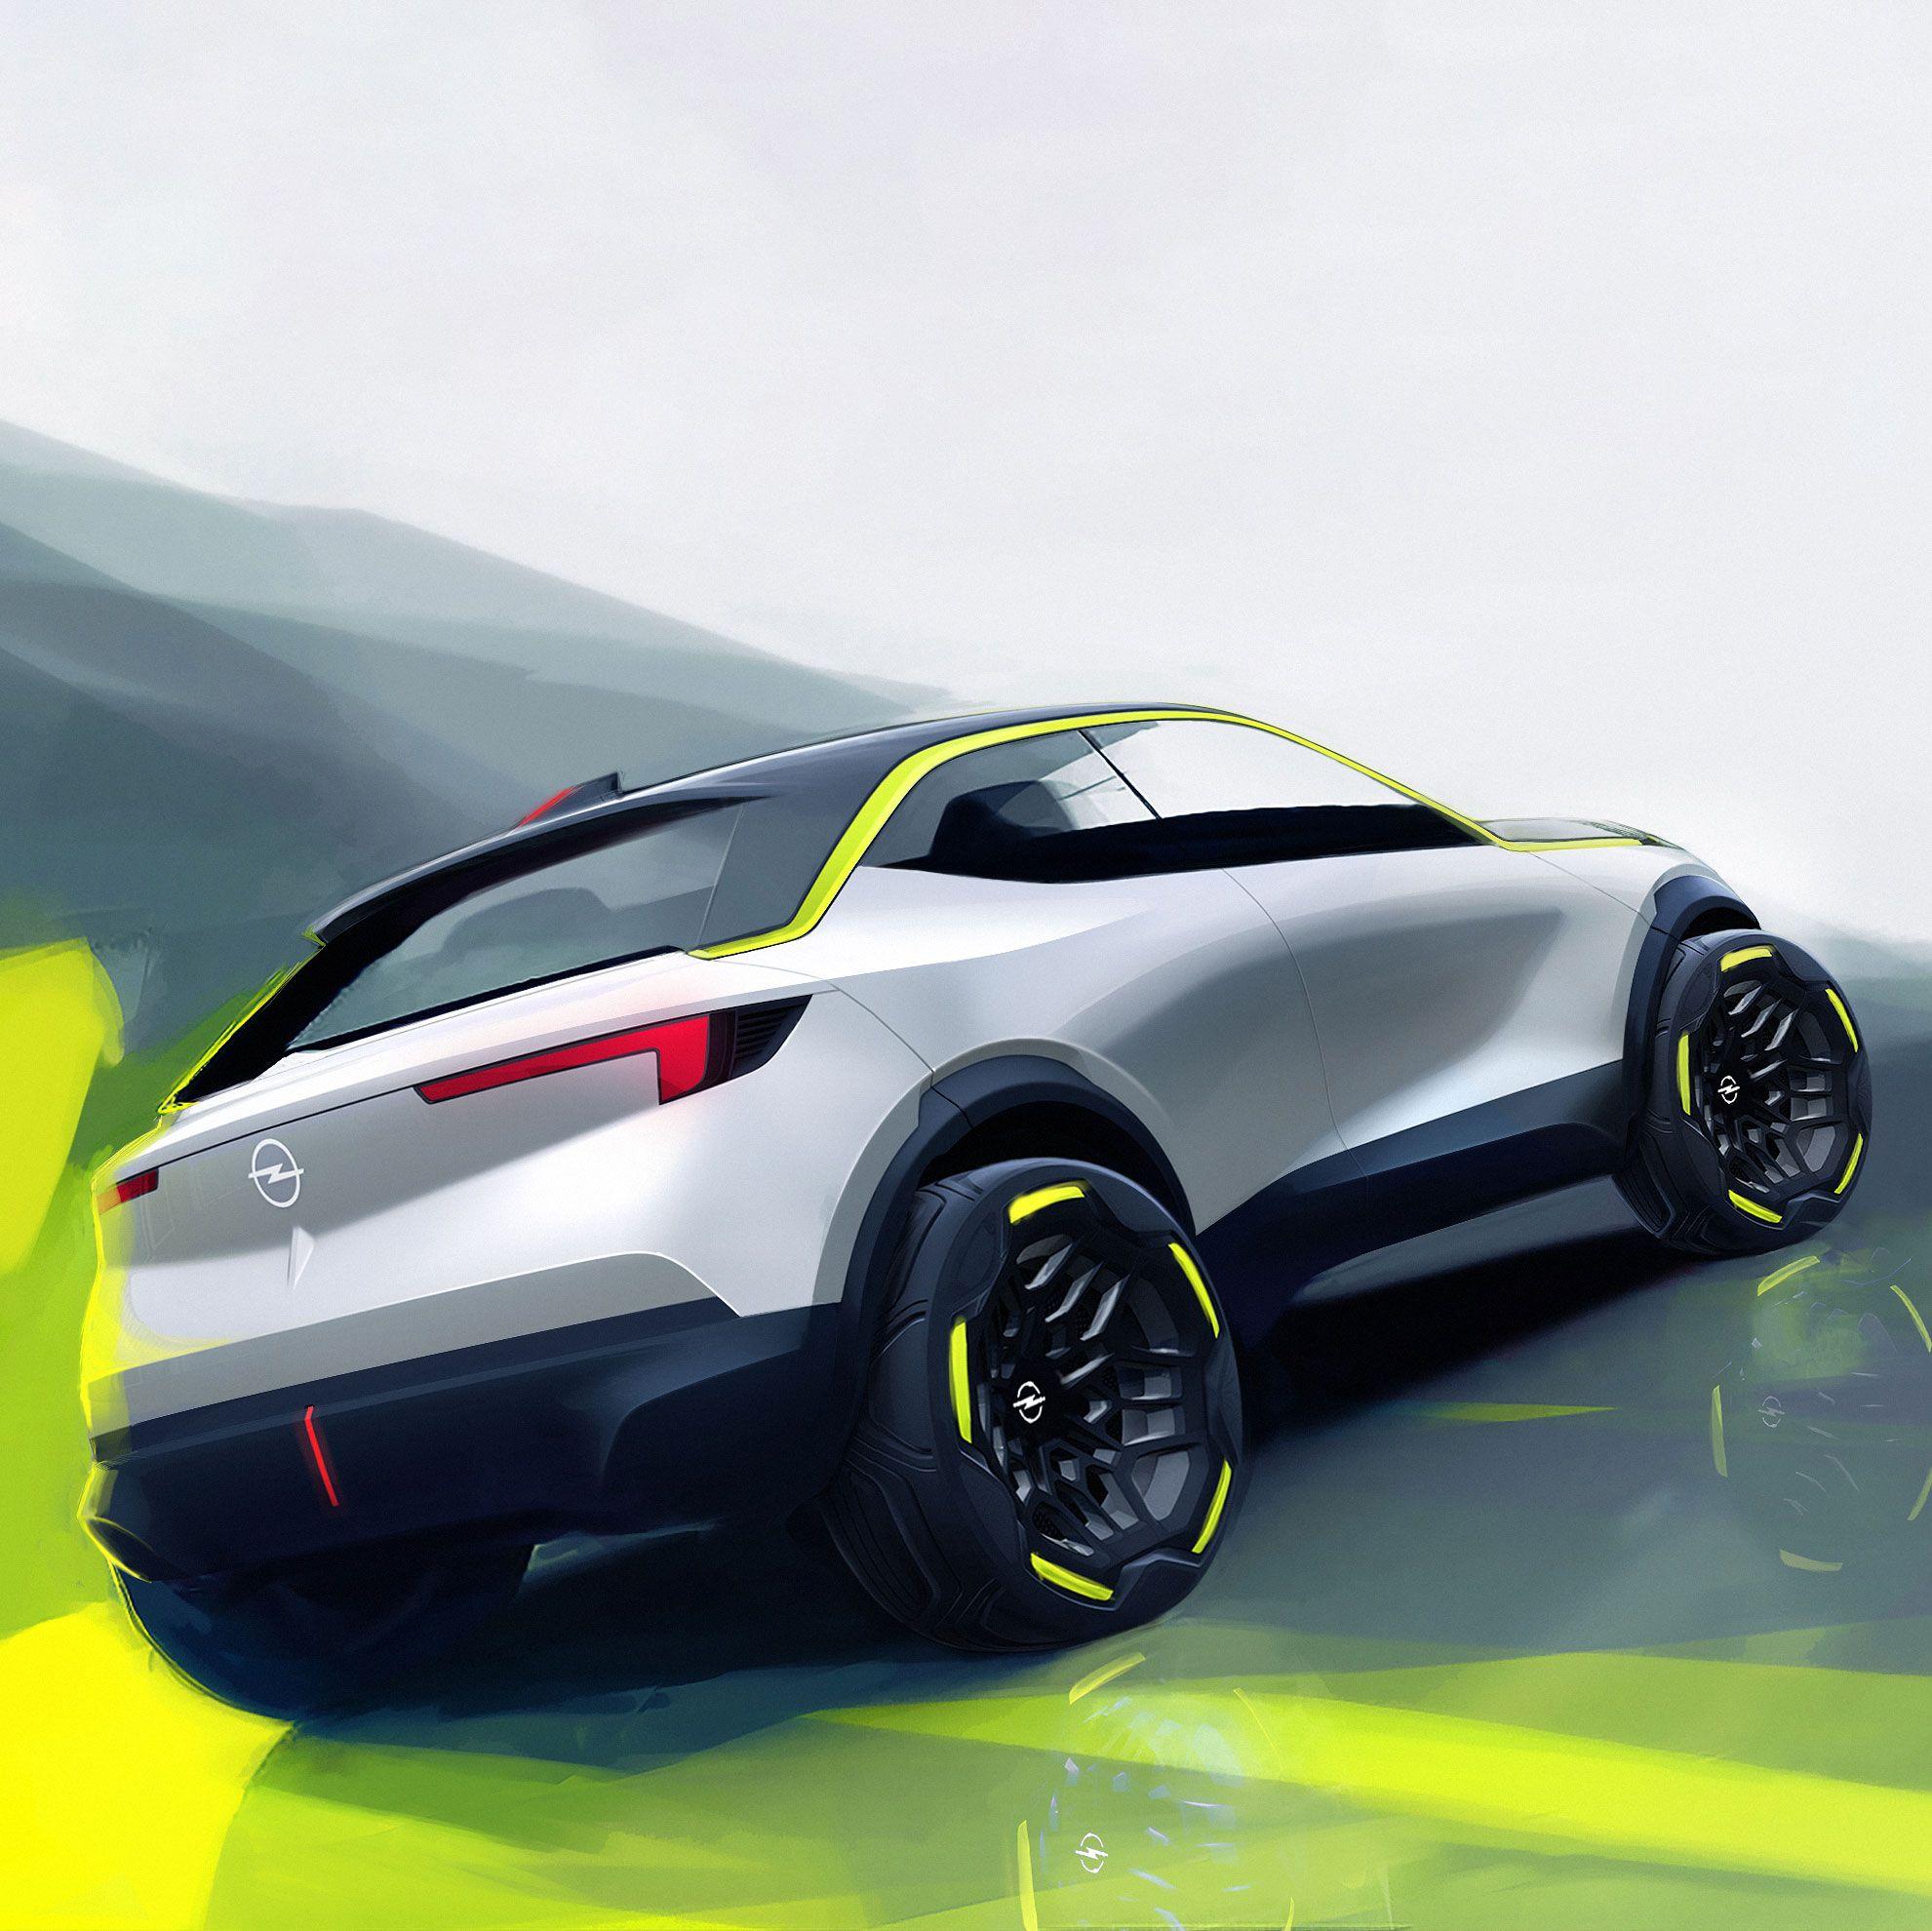 ArtStation Retro Futuristic Mercedes Concept Car M Lcio Sleek